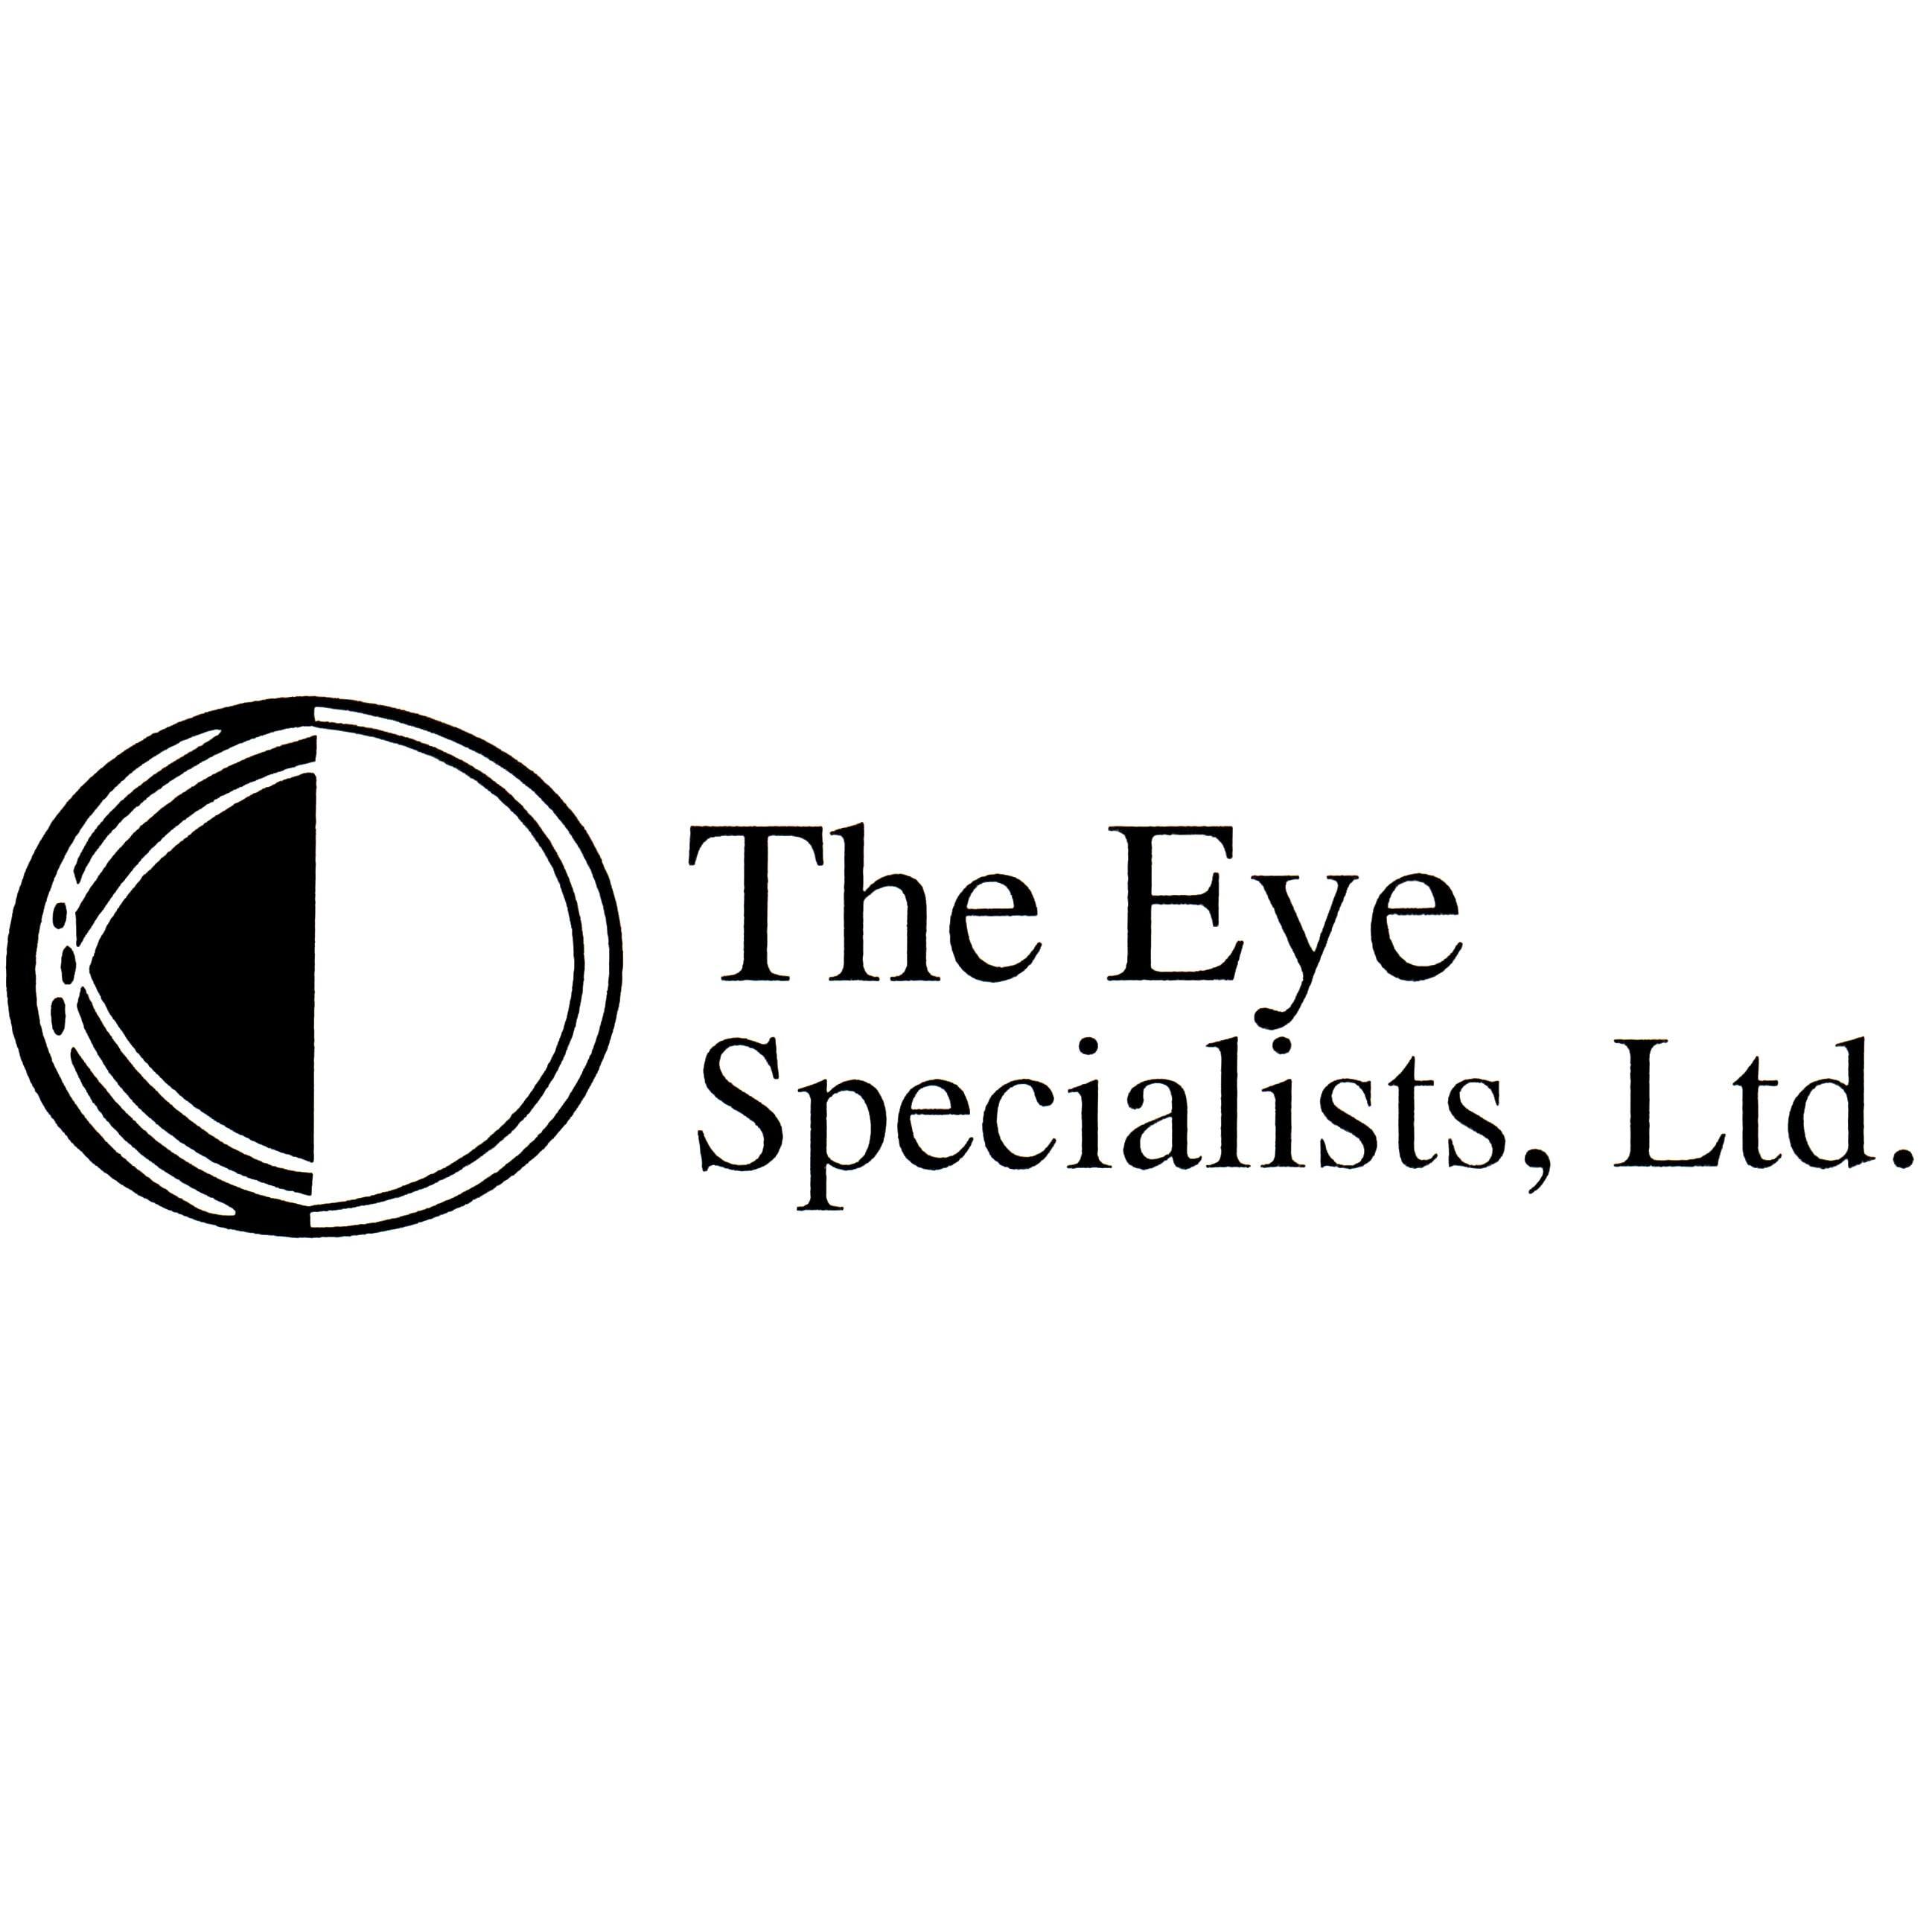 The Eye Specialists LTD